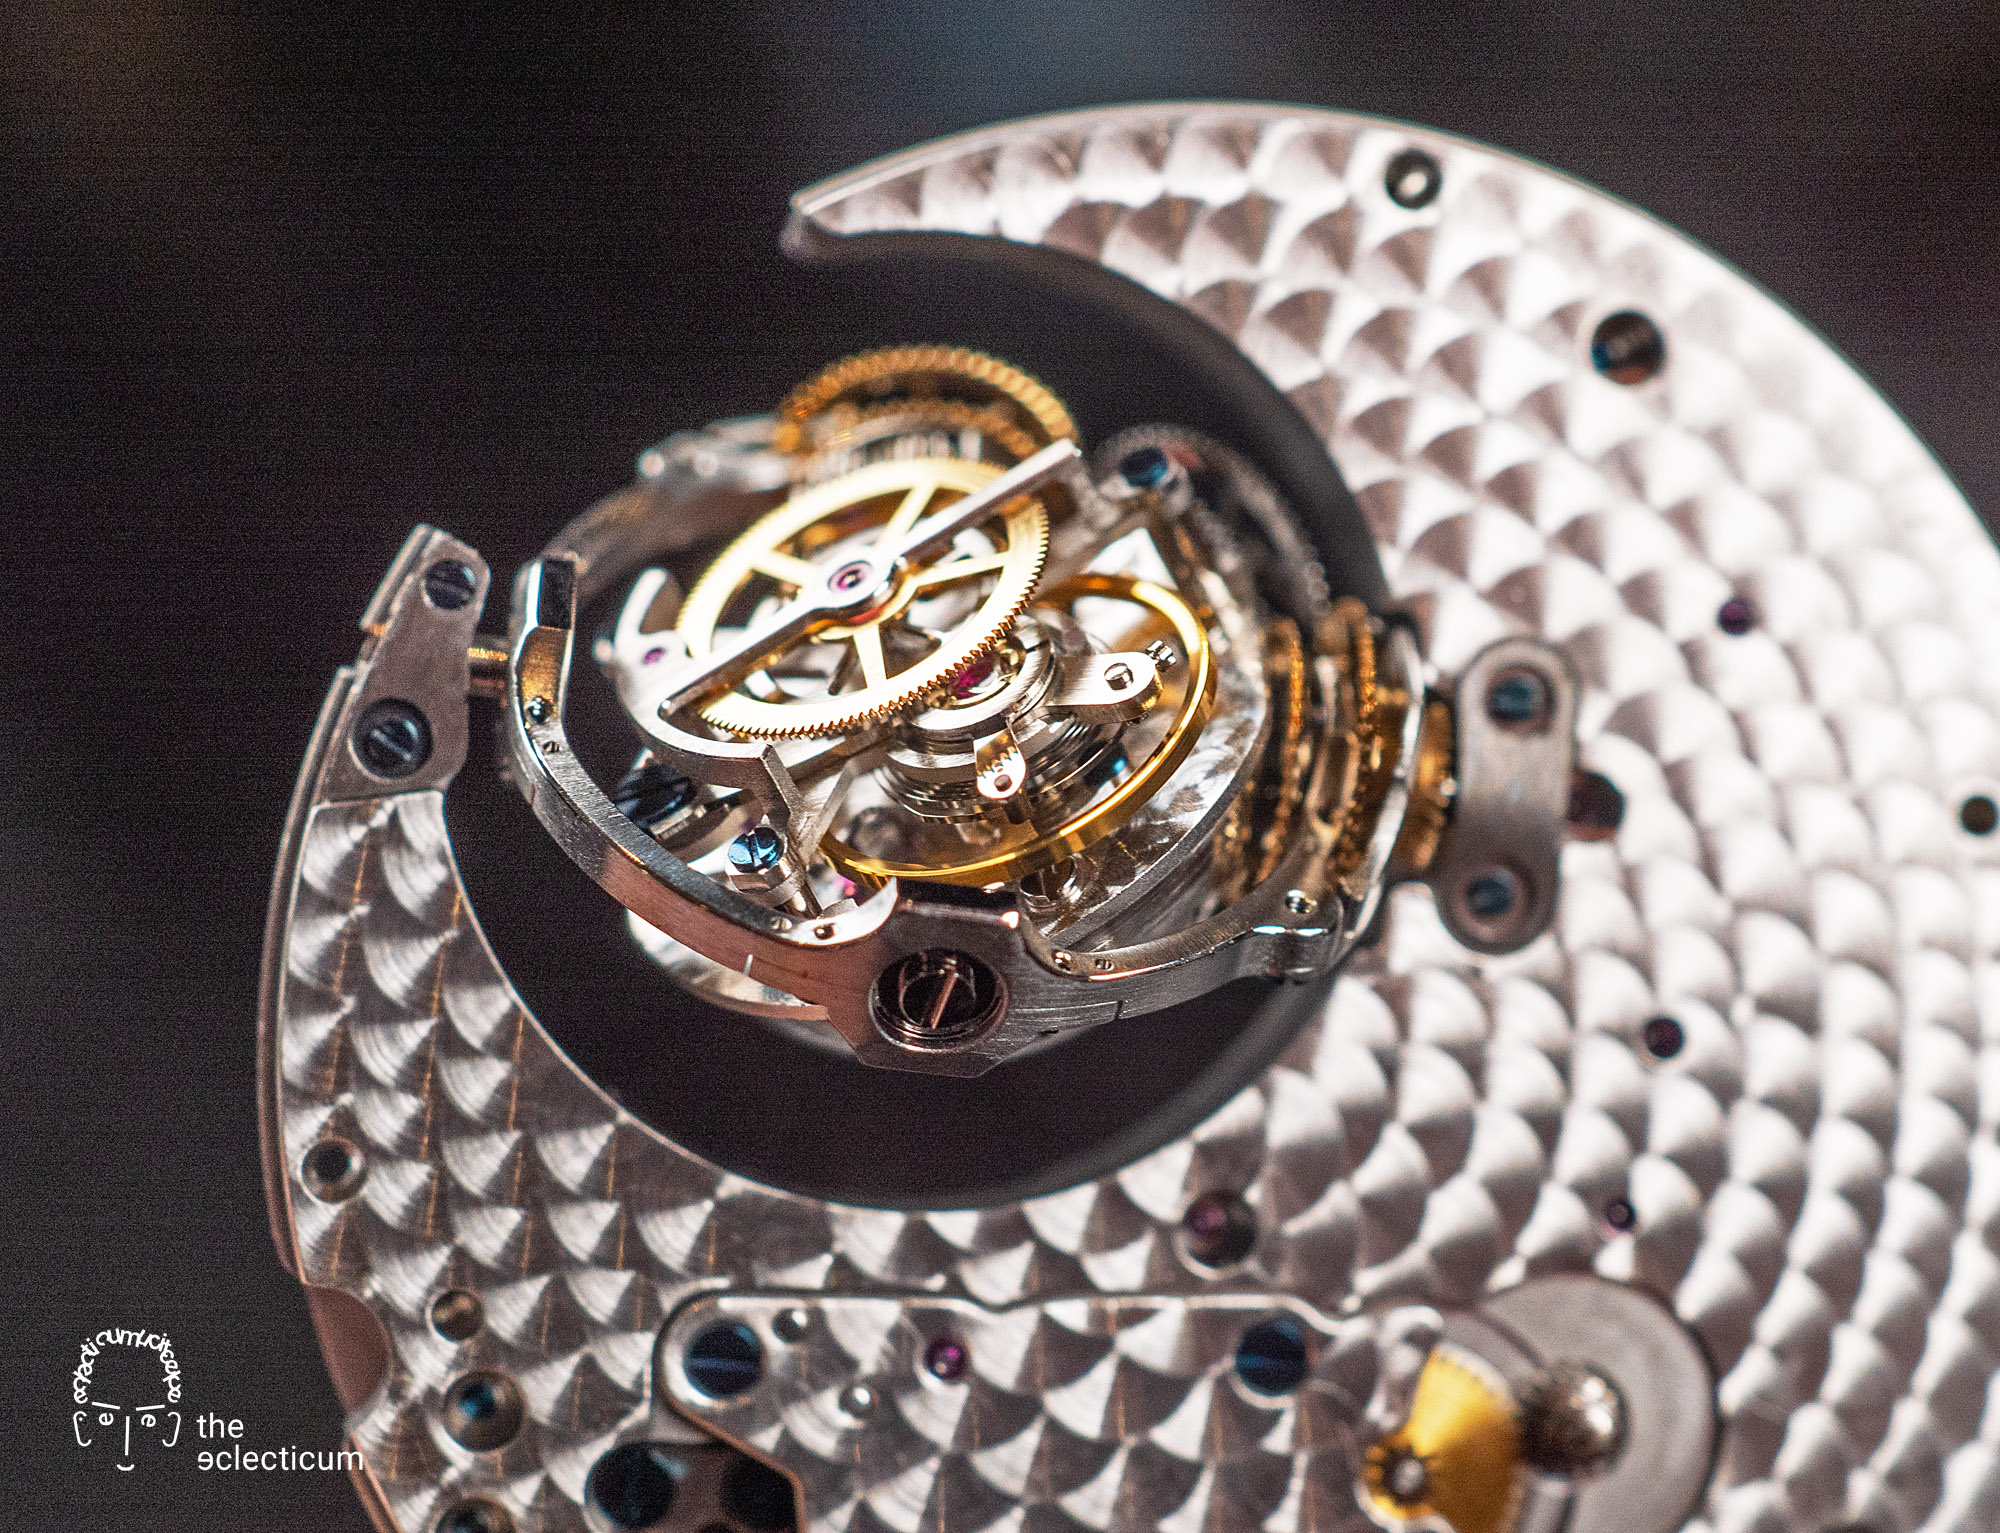 Zenith Gyroscope detail